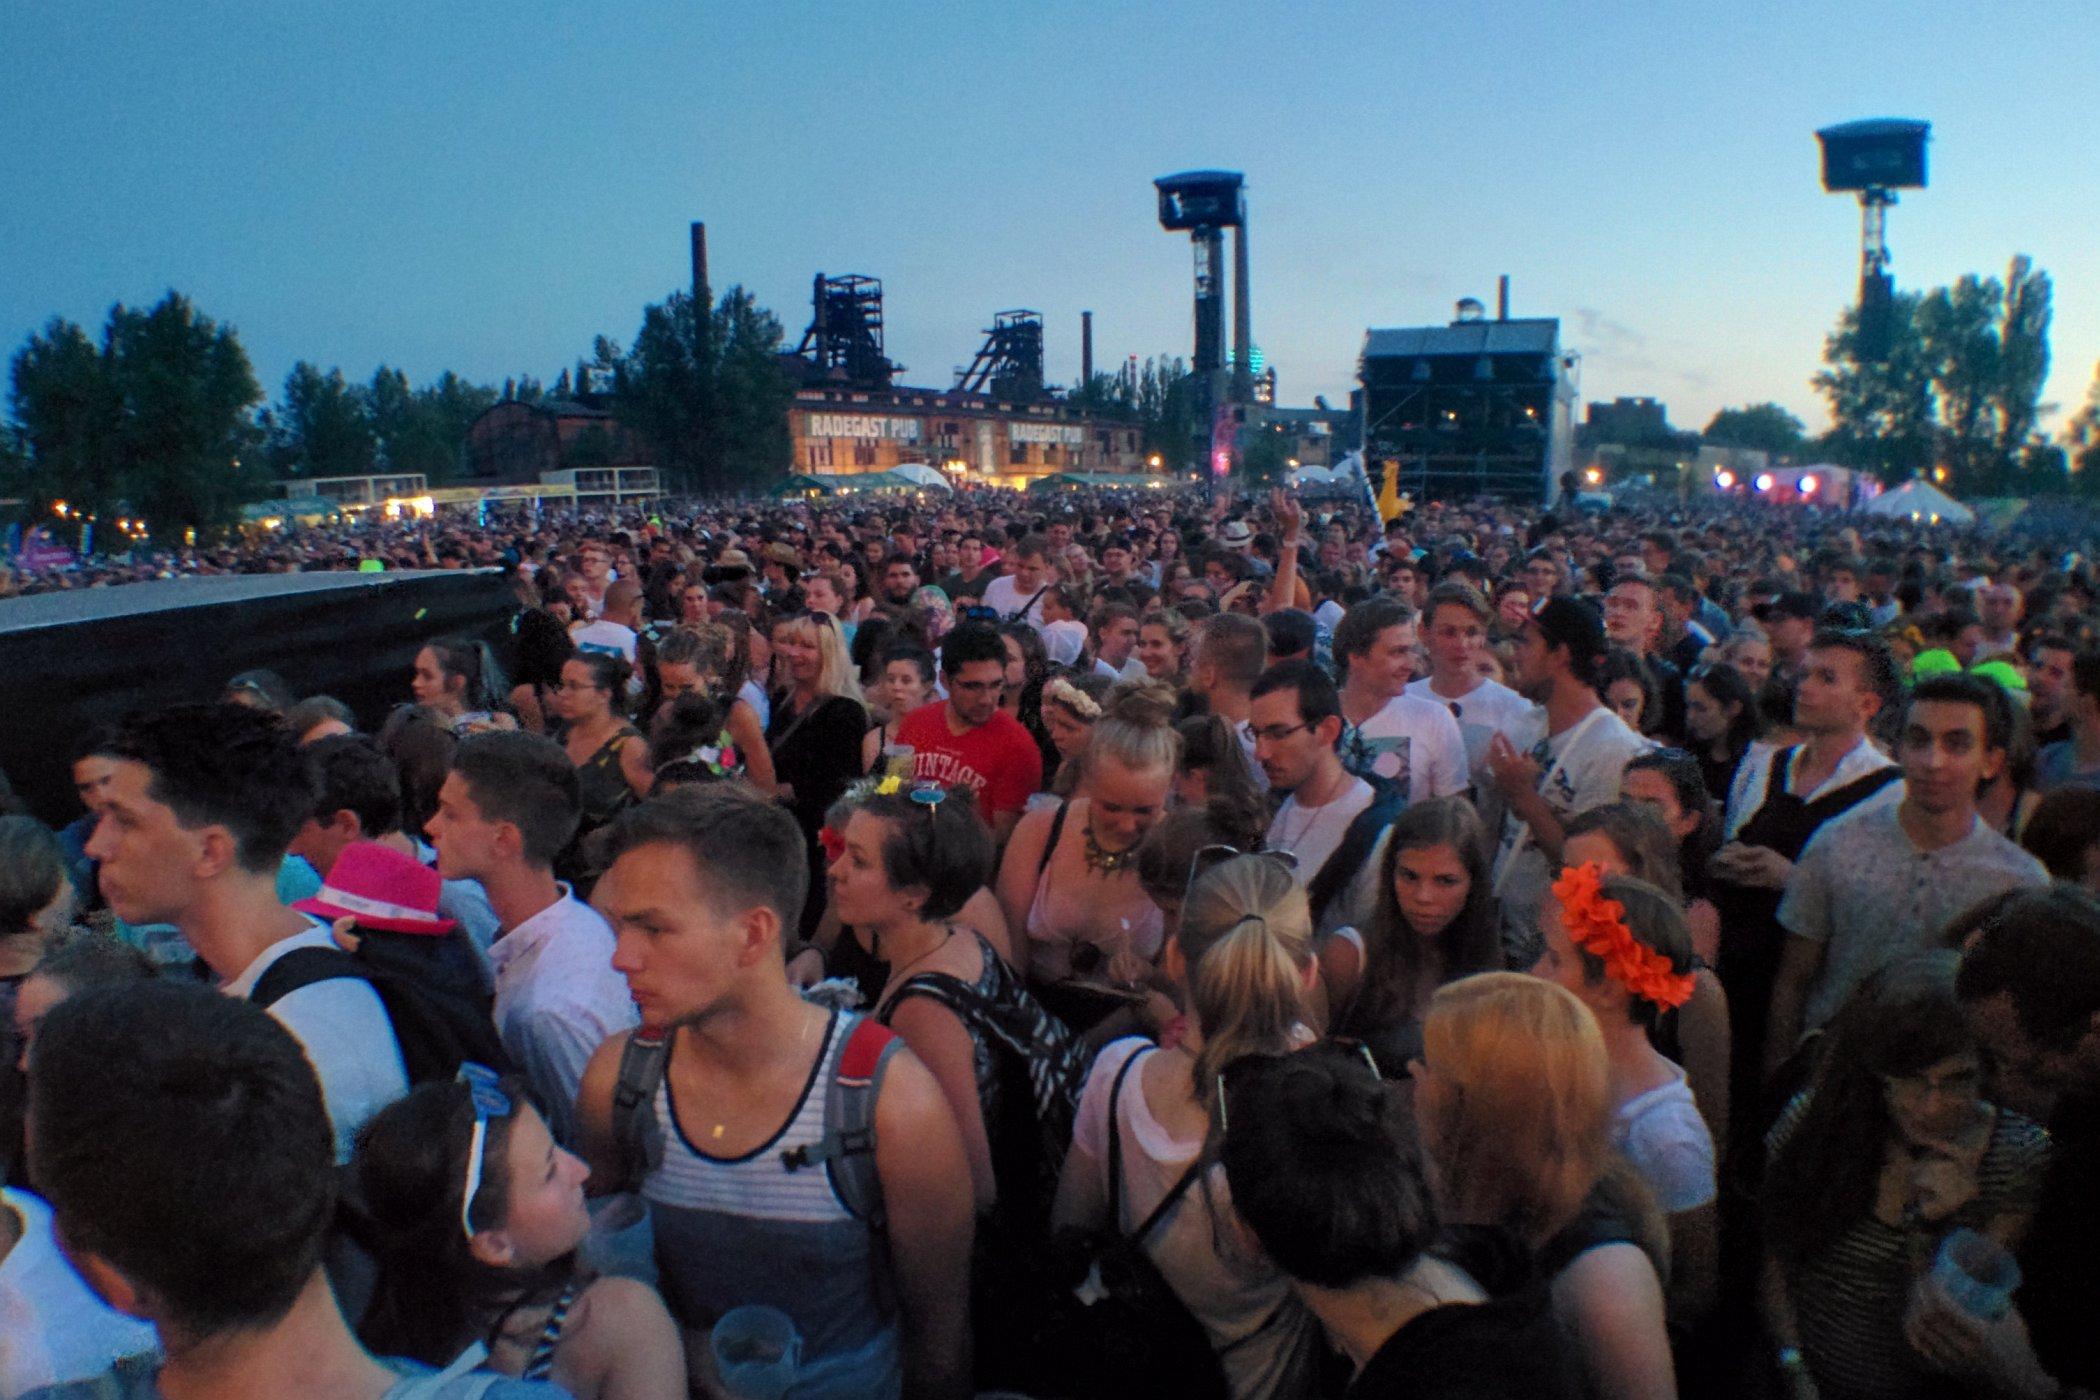 Publikum festivalu Colours of Ostrava 2017